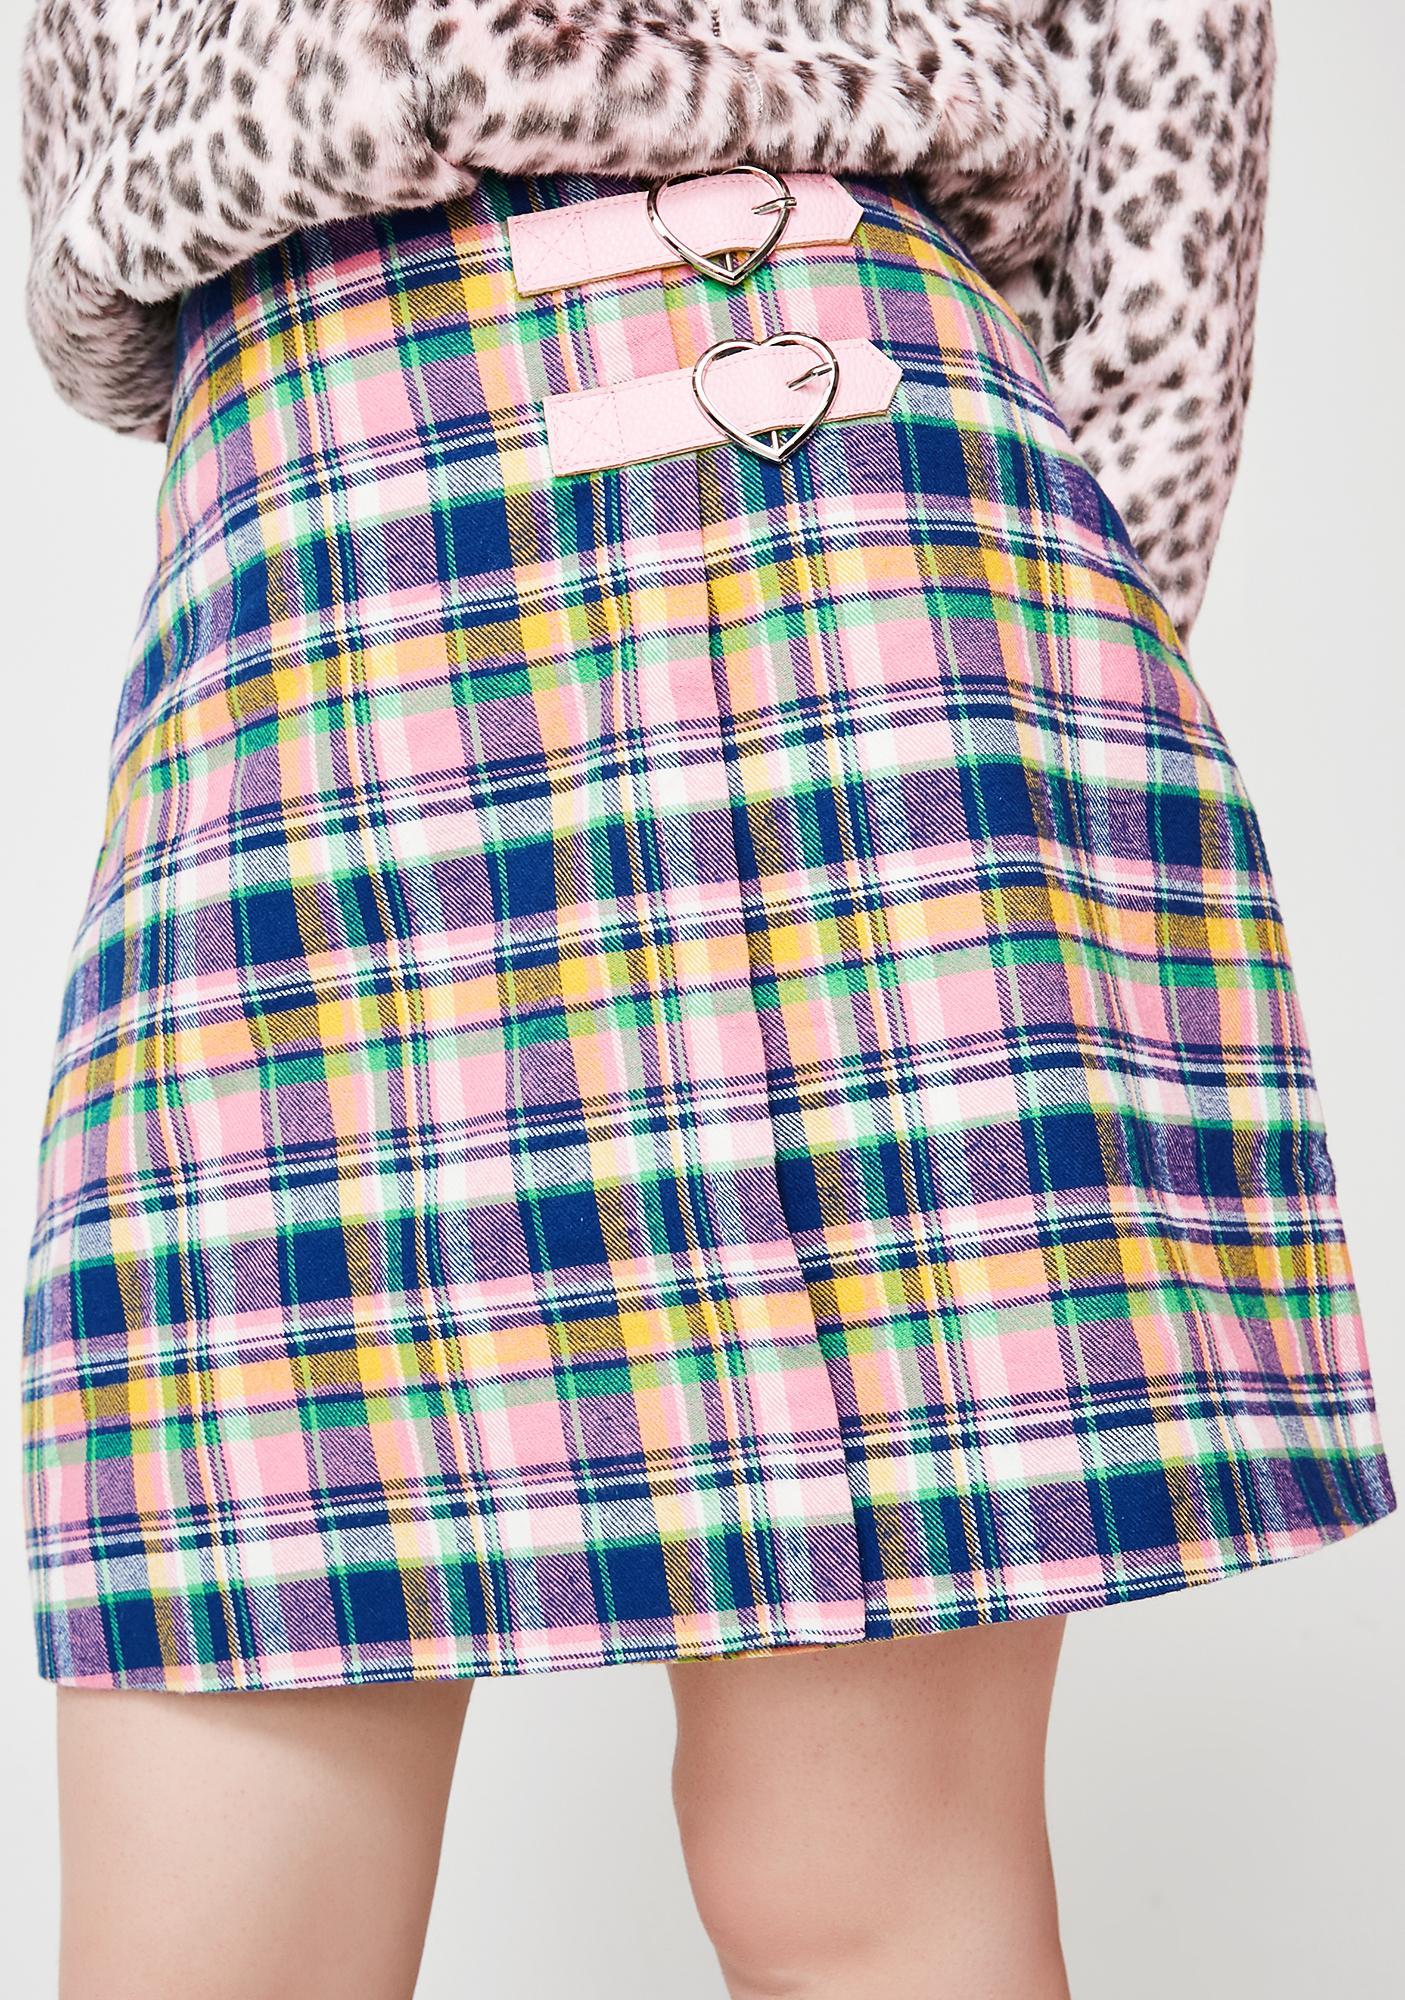 Lazy Oaf Check Kilty Skirt